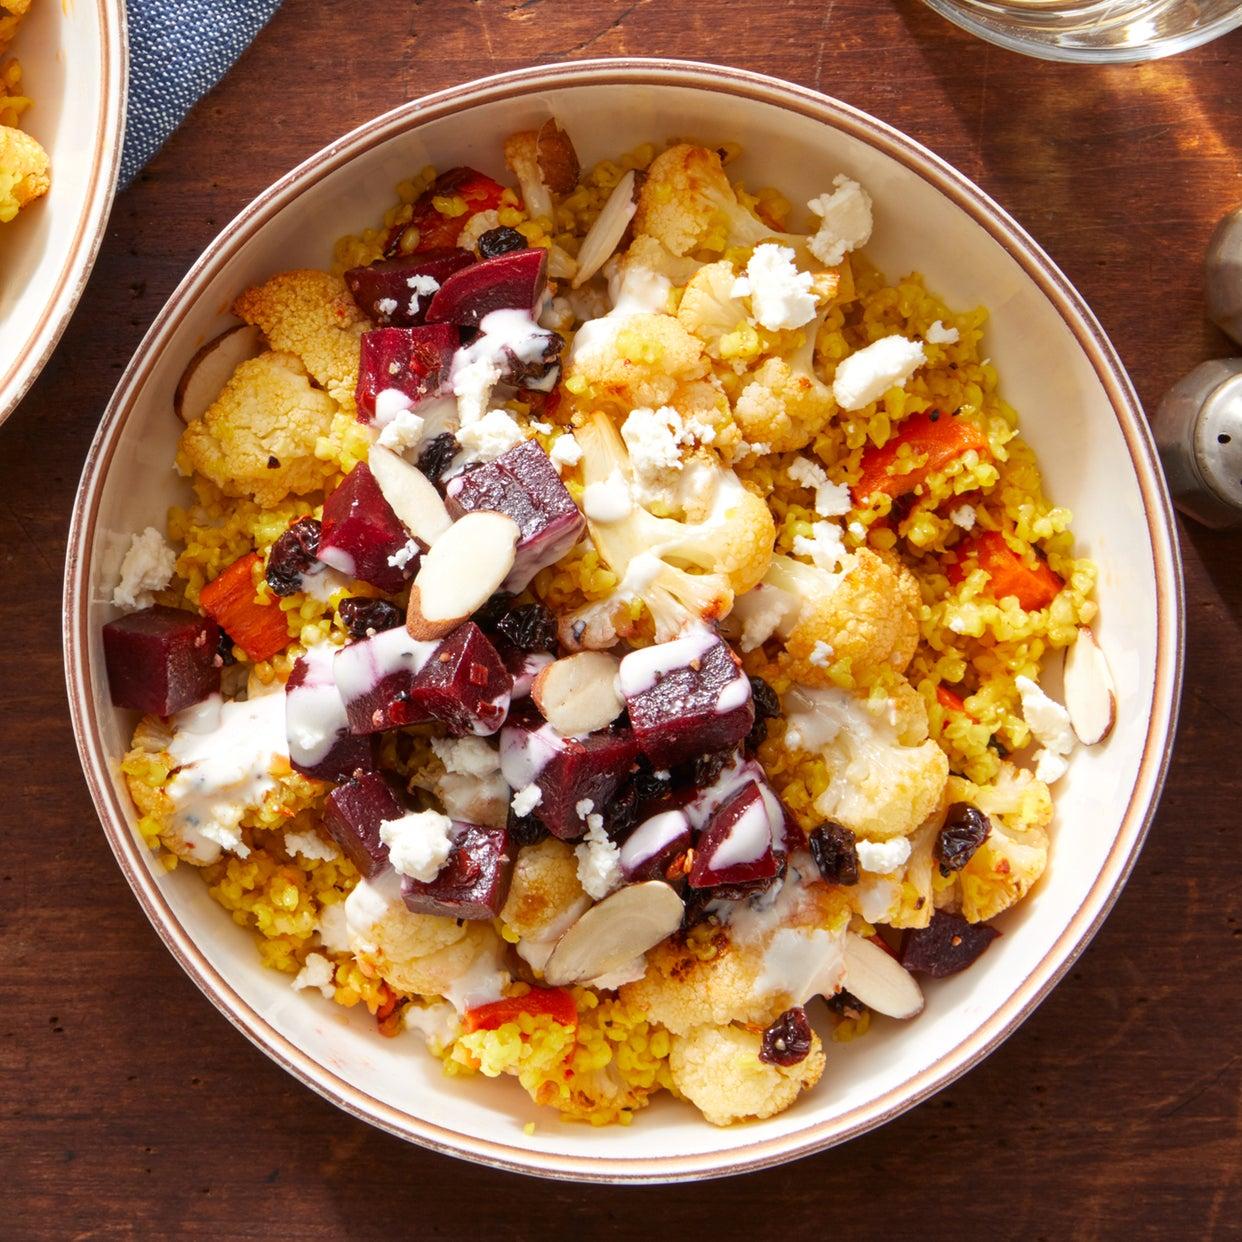 Mediterranean Grain Bowl with Harissa-Roasted Vegetables & Labneh Sauce